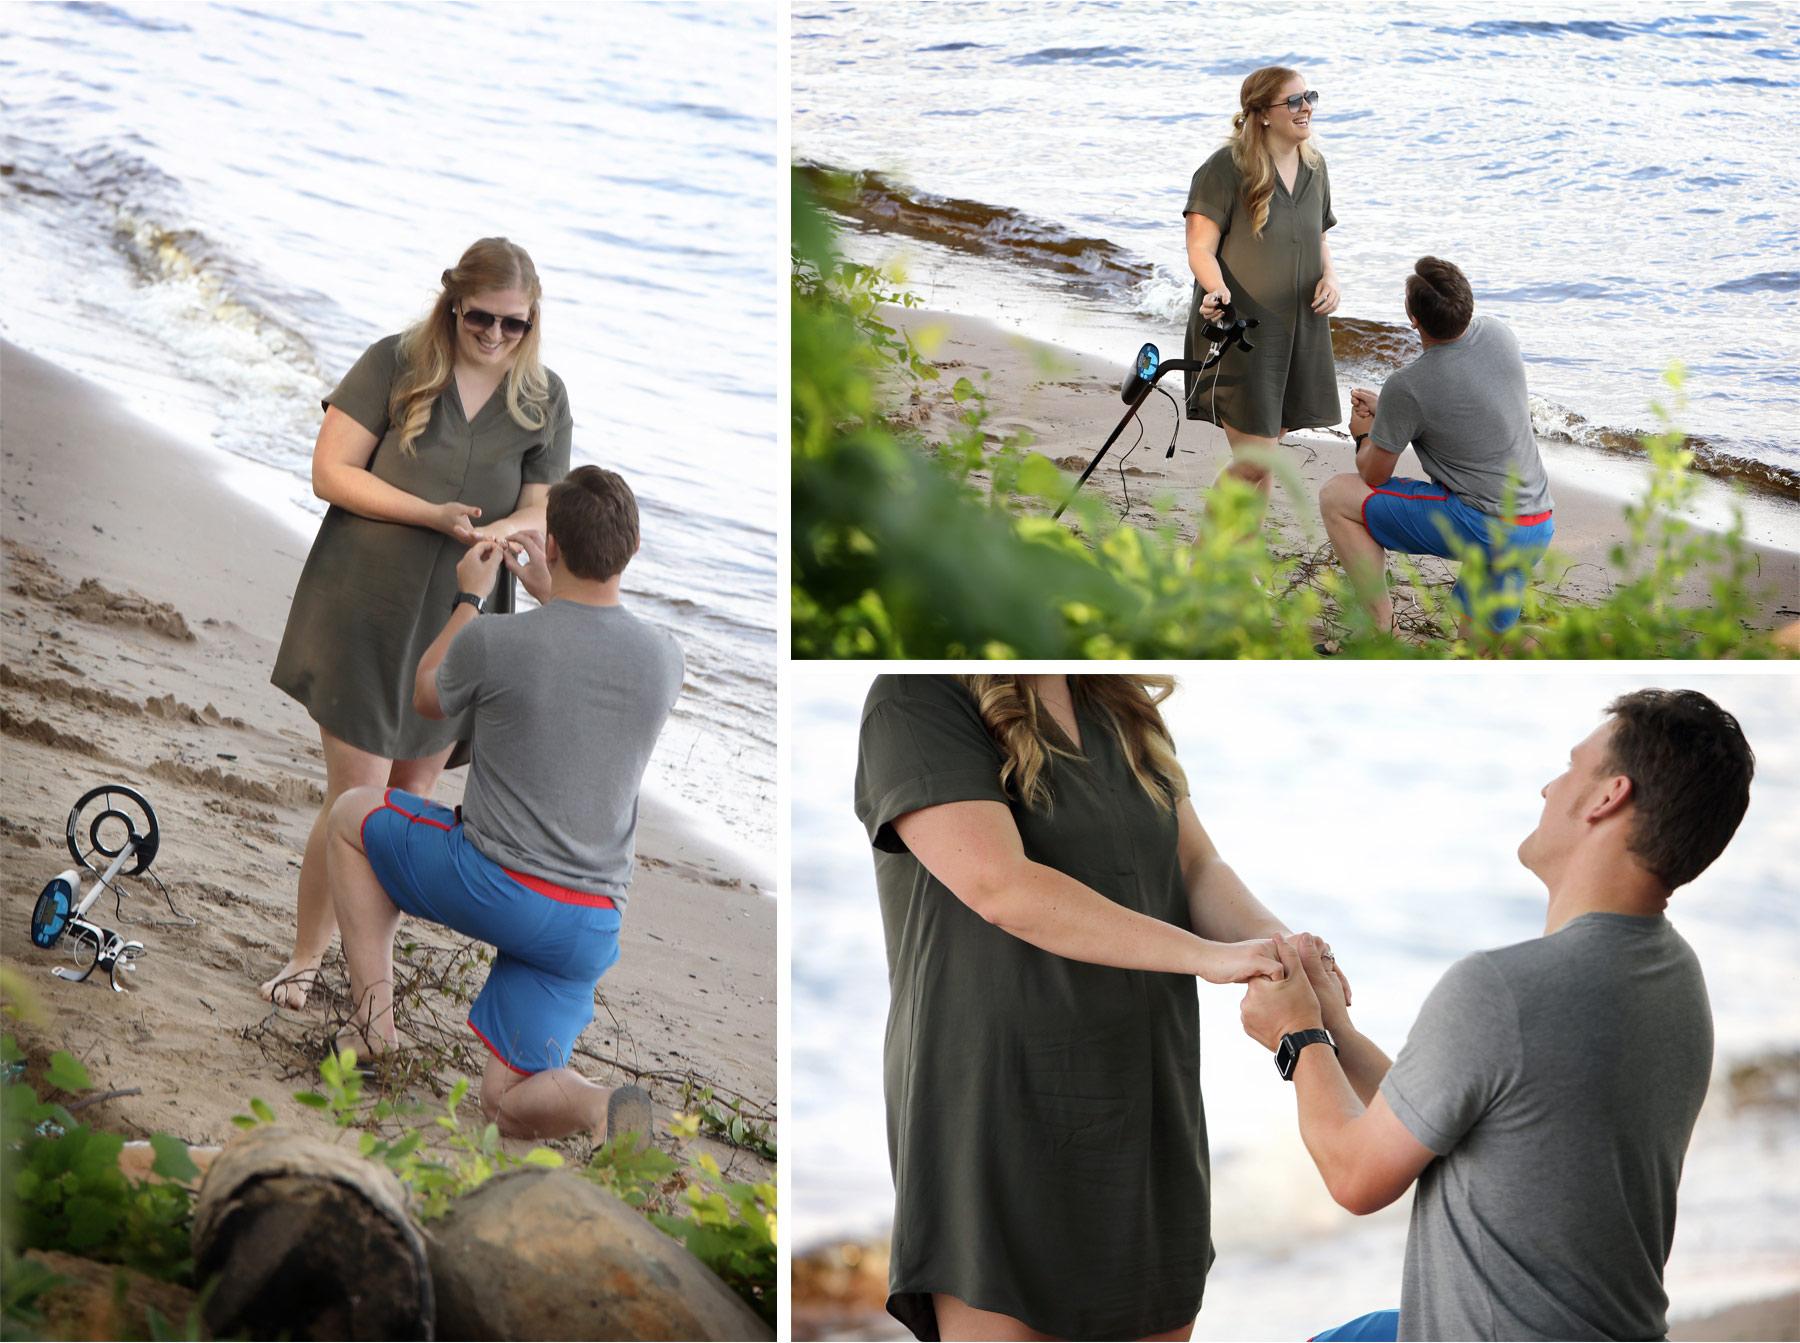 05-Vick-Photography-Proposal-Minnesota-Minneapolis-Beach-Metal-Detectors-Veronica-and-Tyler.jpg